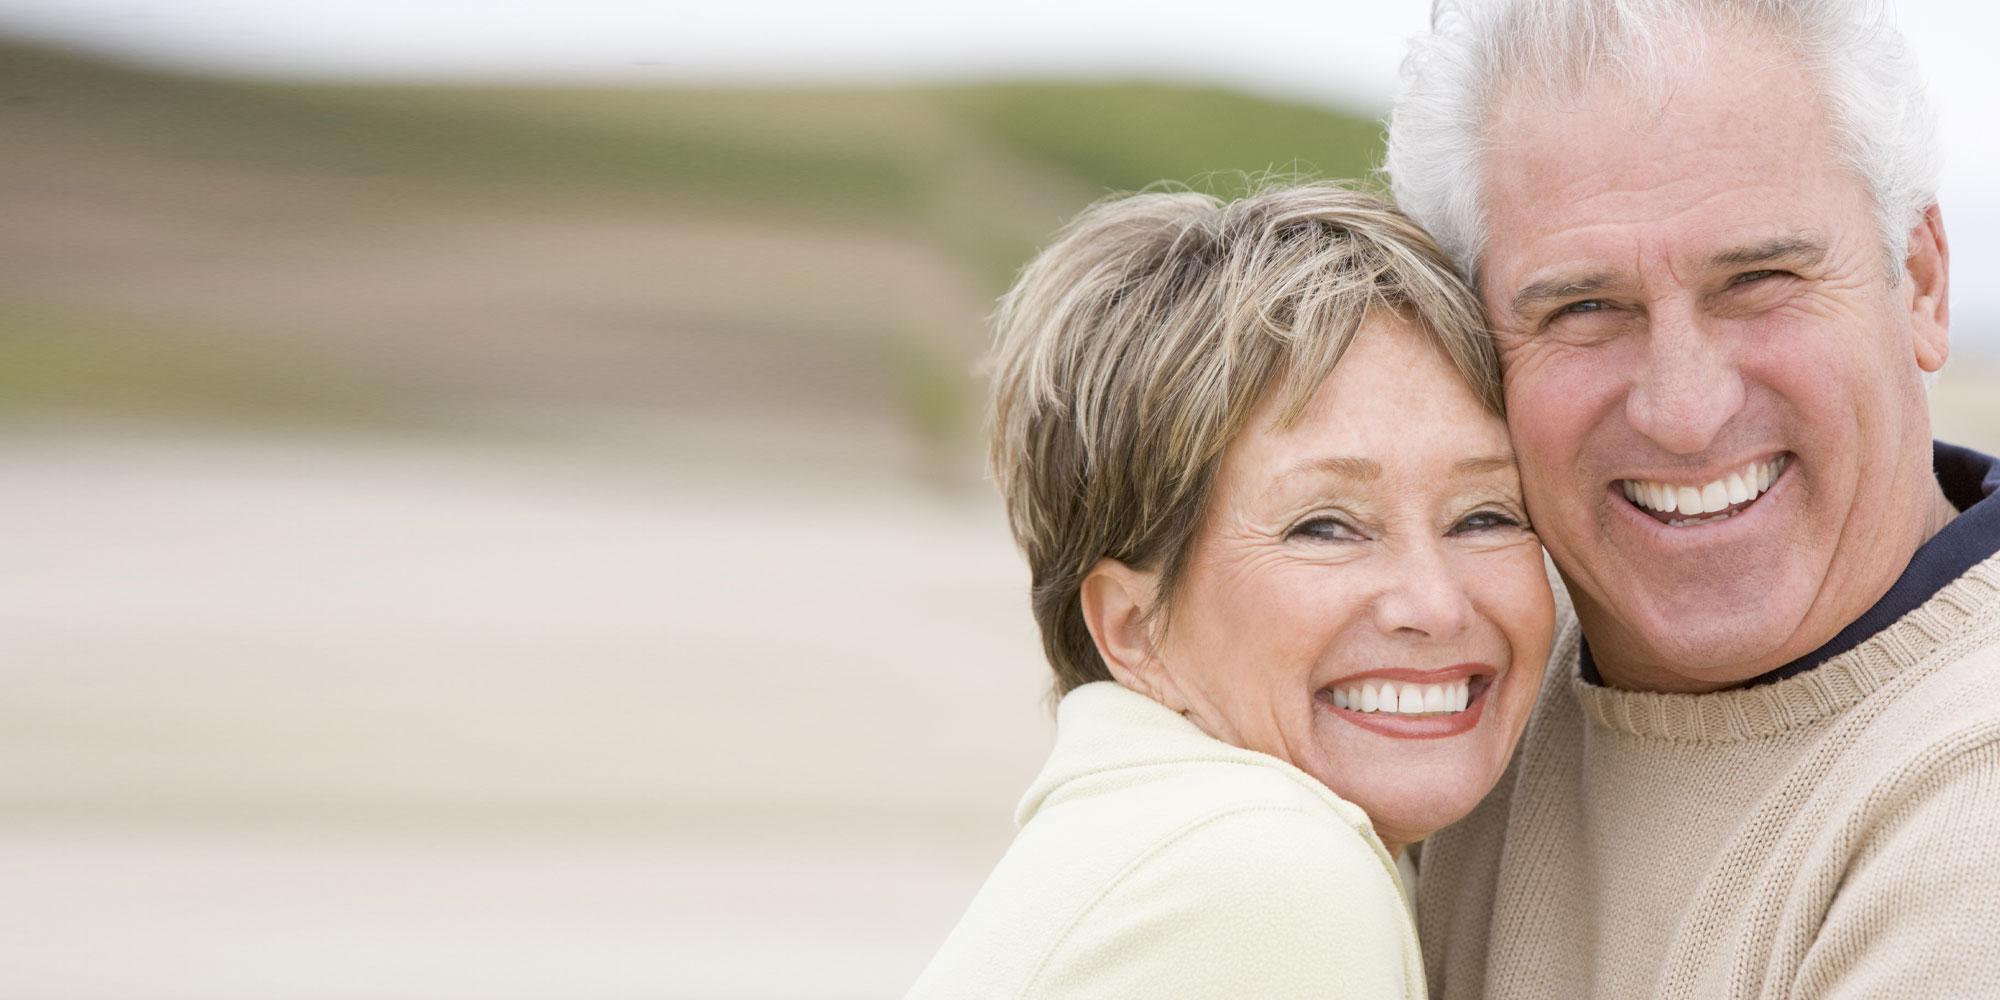 same day dental implants patient smiling